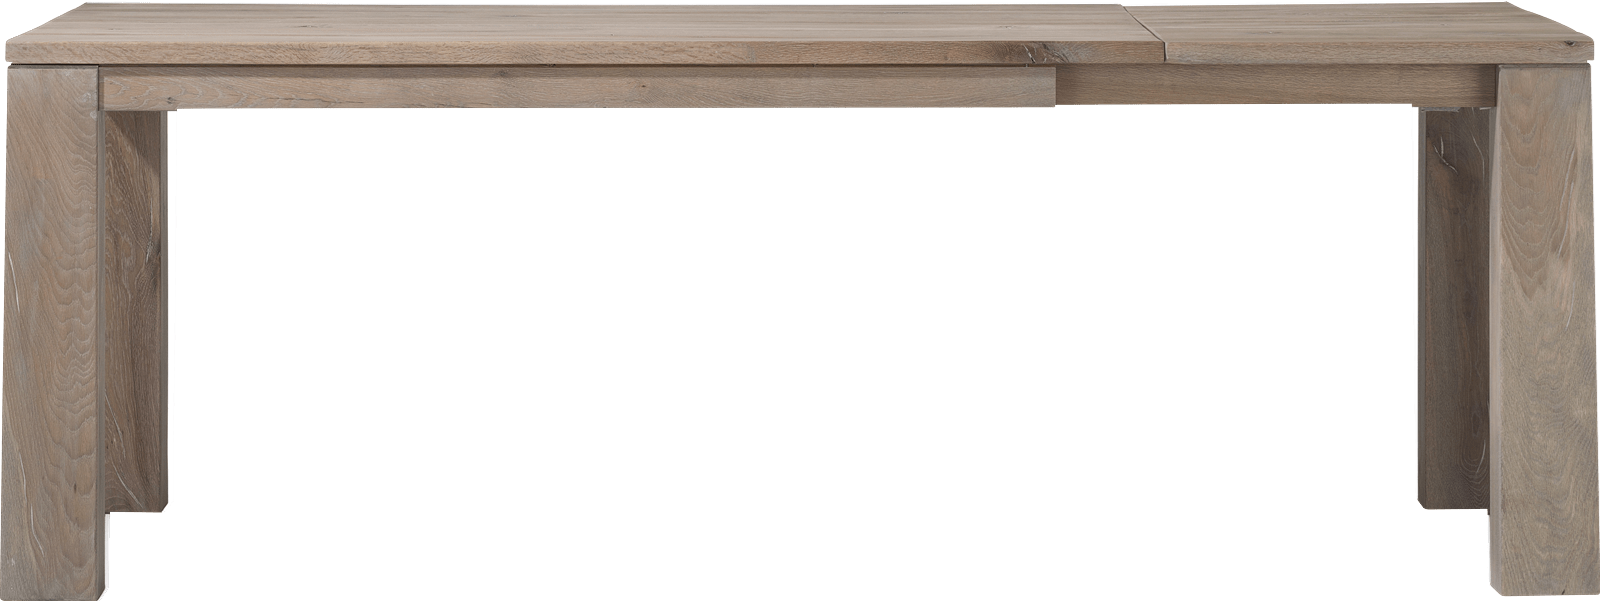 Masters - uitschuiftafel 160 (+ 60) x 90 cm - hout 9x9